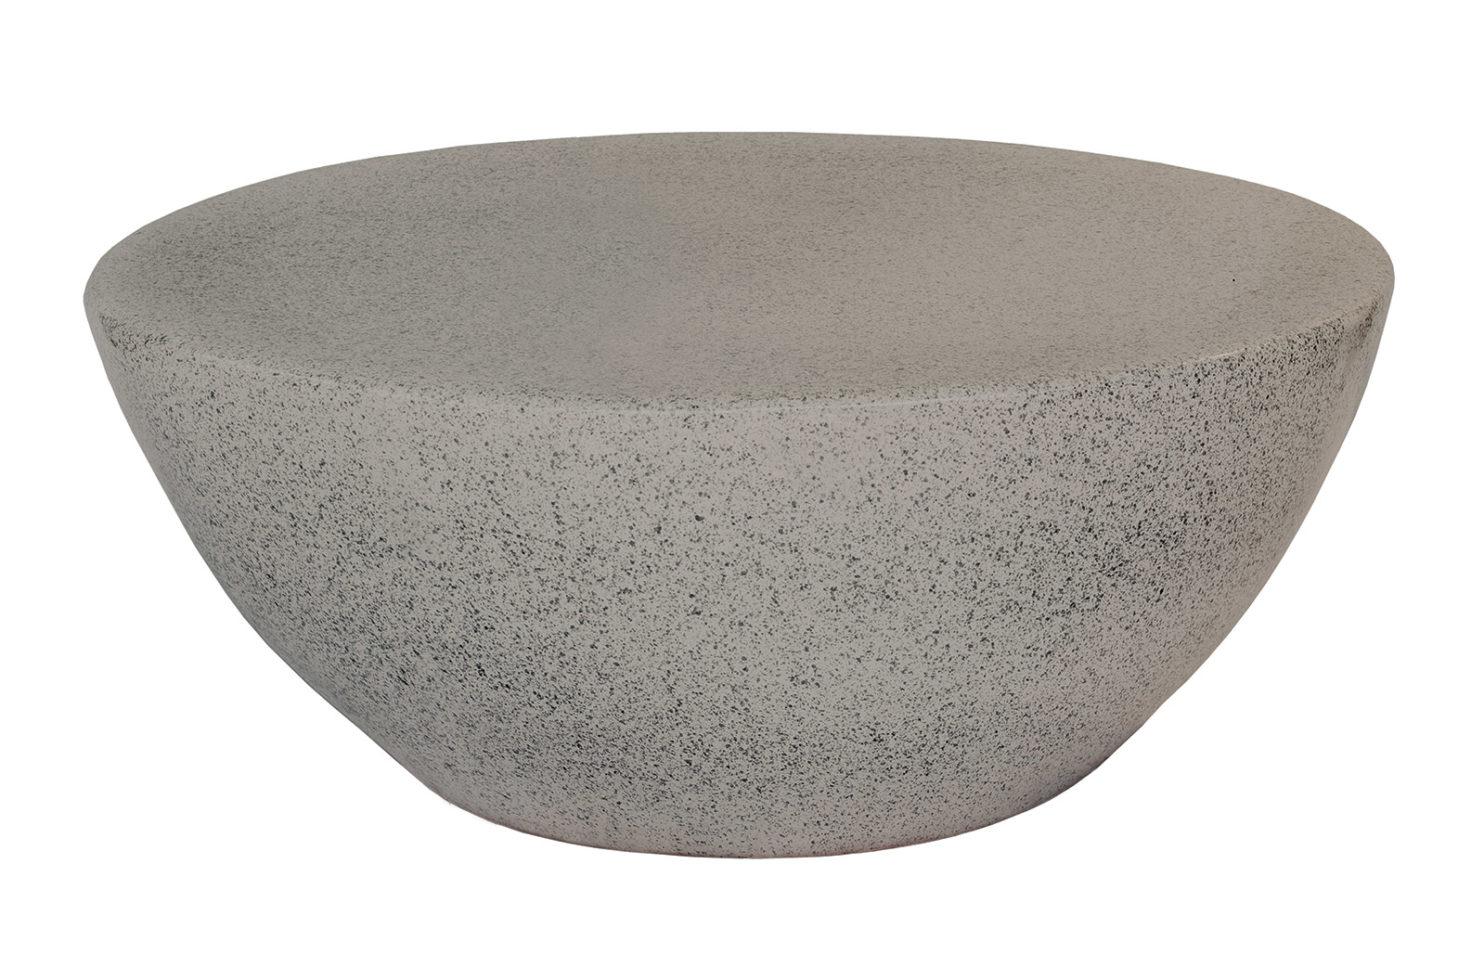 Ceramic Bowness 308FT293P2GR